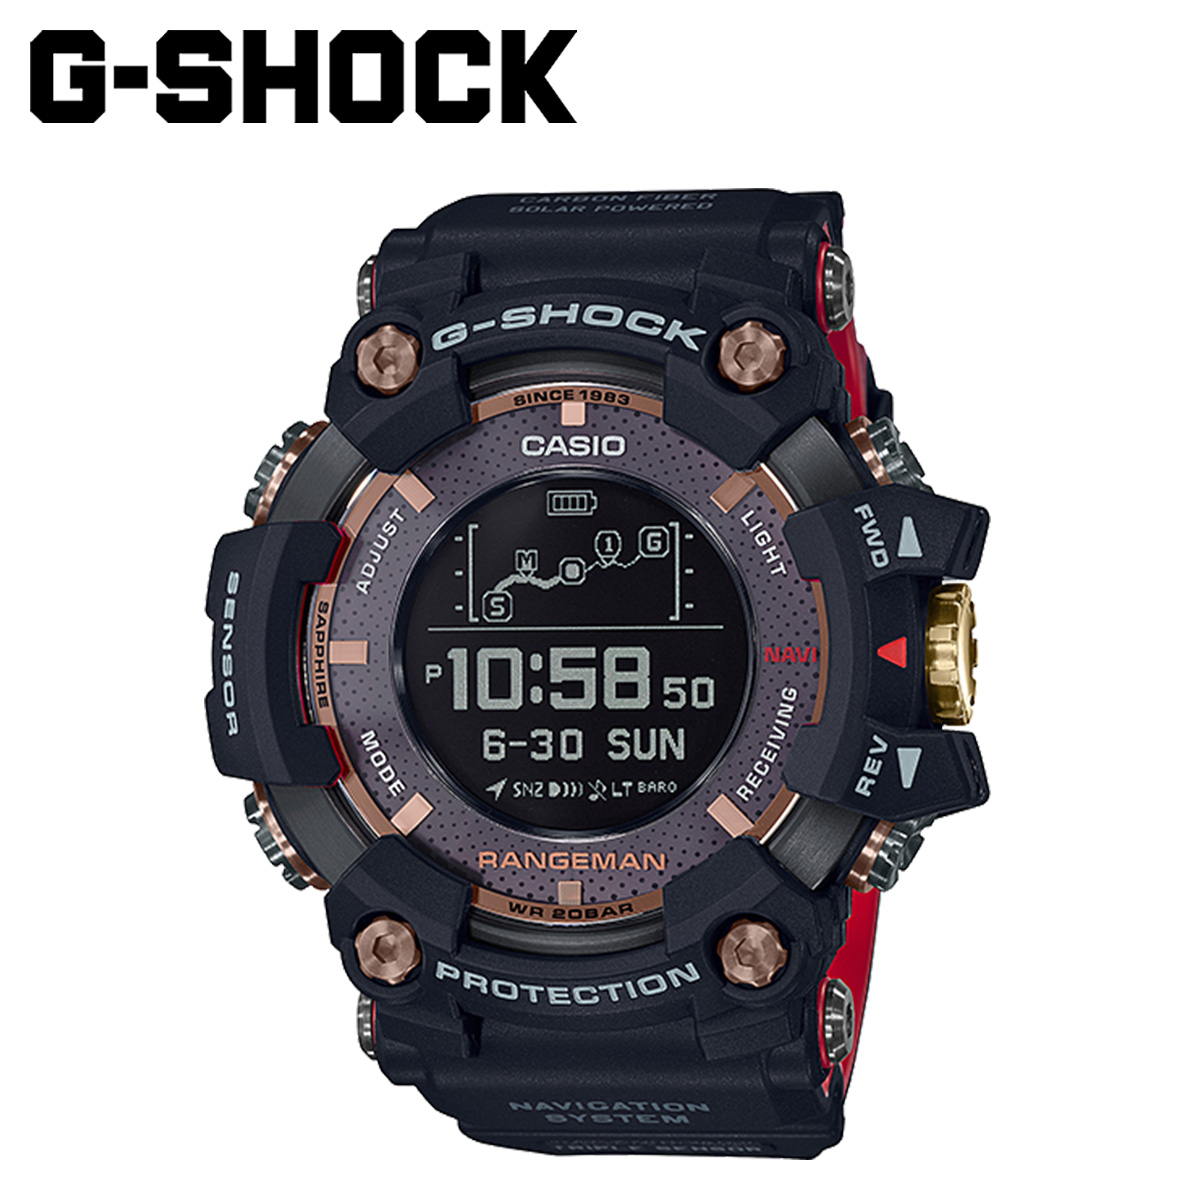 CASIO カシオ G-SHOCK 腕時計 GPR-B1000TF-1JR RANGEMAN MAGMA OCEAN 35周年 ブラック メンズ レディース